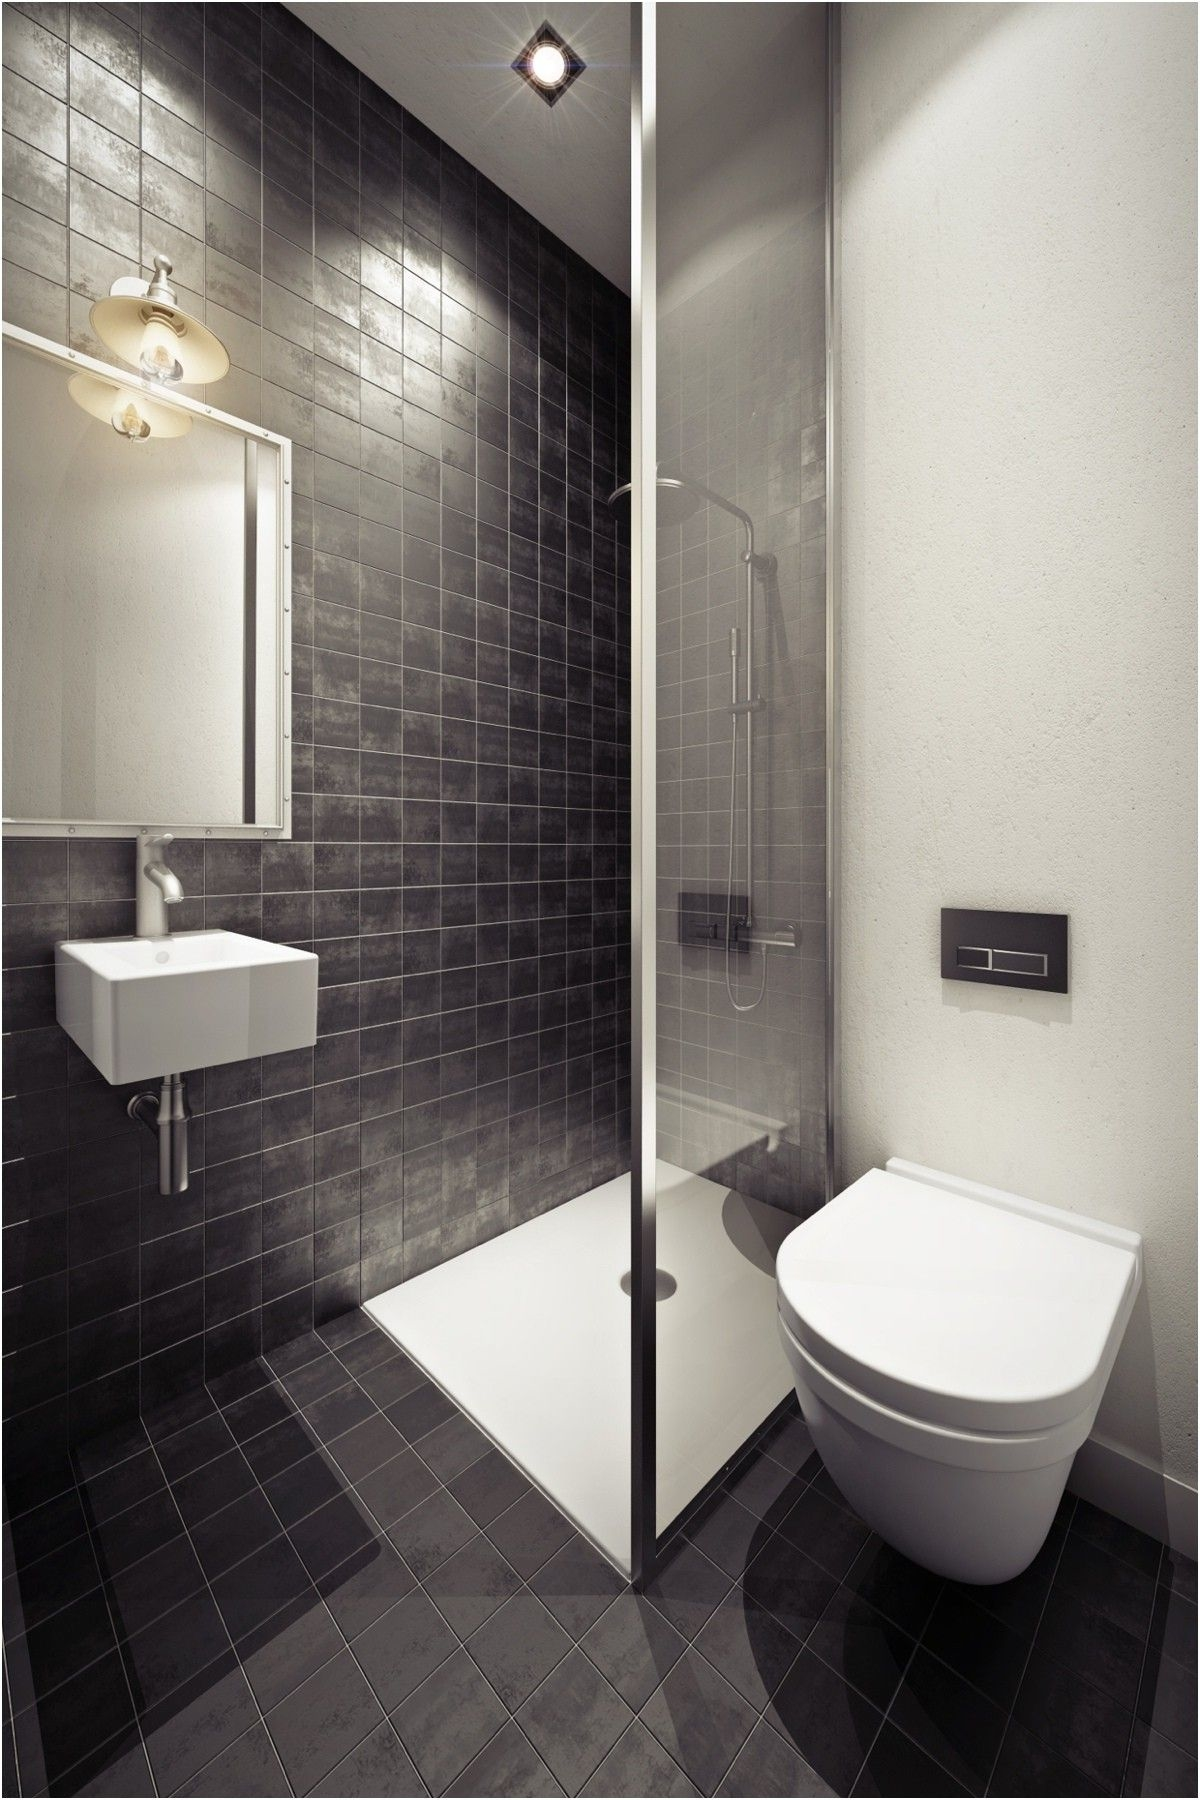 bathroom design ideas 2019 orchard square straight shower bath suite modern bathroom  design ideas 2019